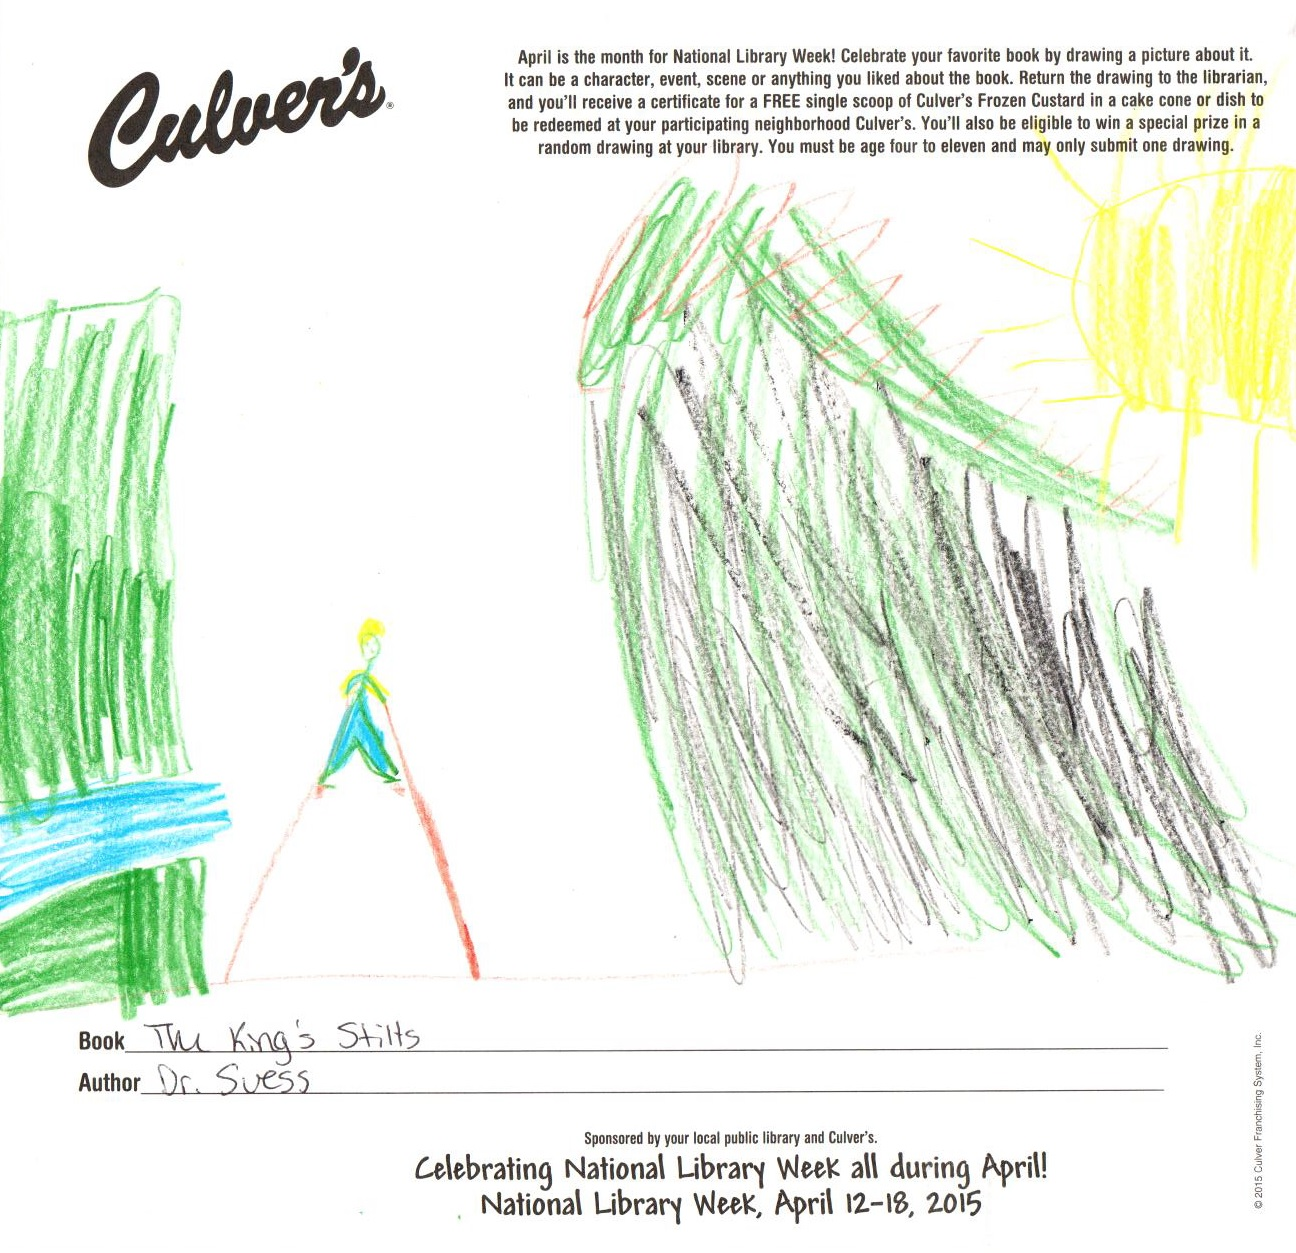 2015 Culver S Contest April 13 30 Hustisford Community